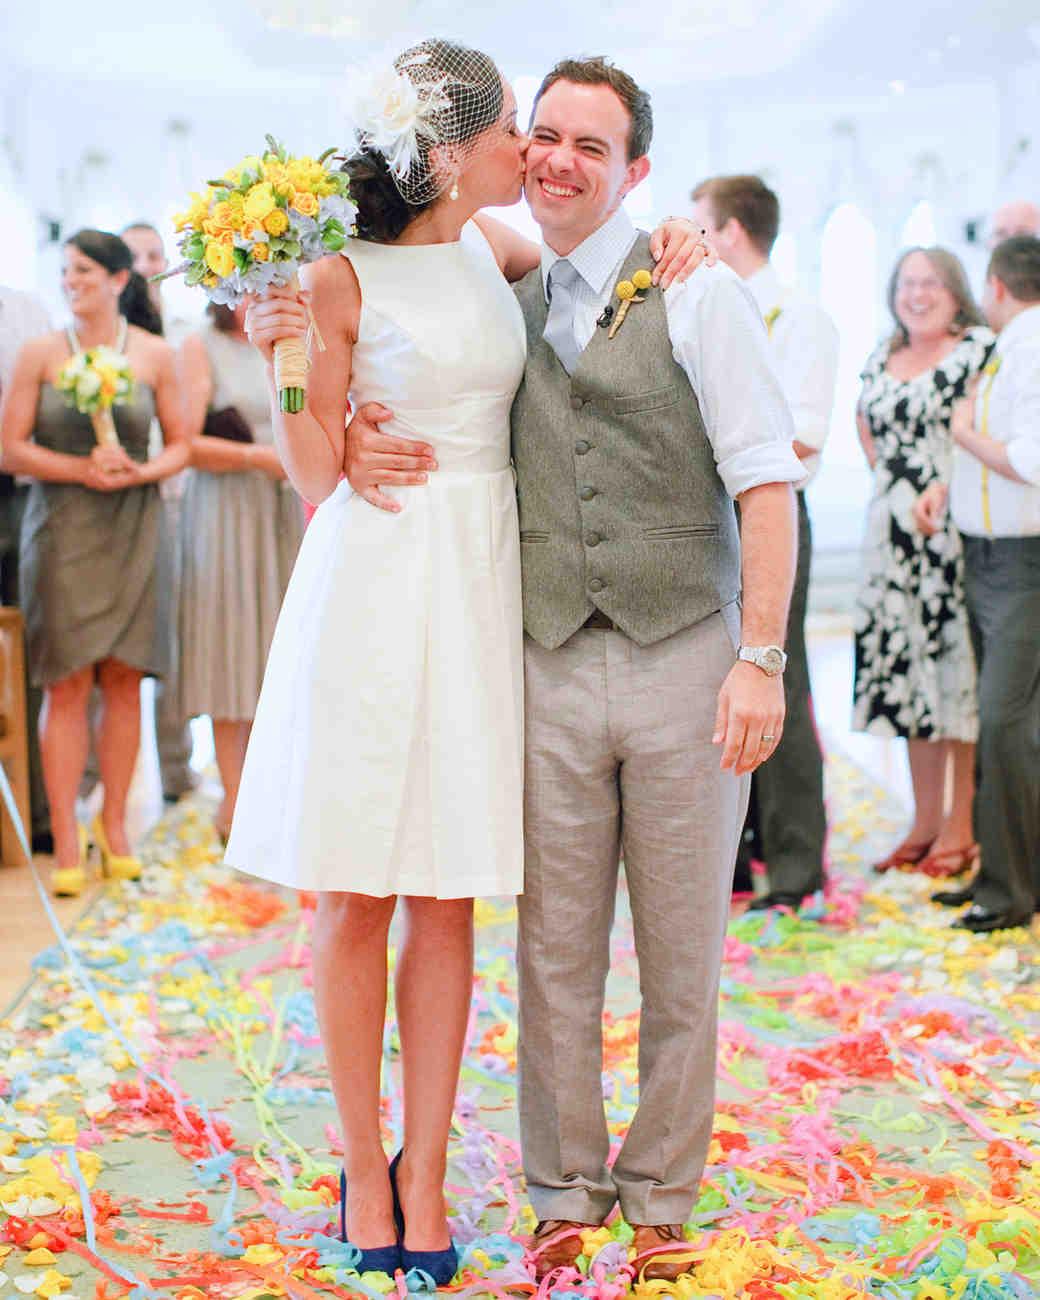 Martha Stewart Weddings: Your Wedding Guest List Etiquette Questions Answered